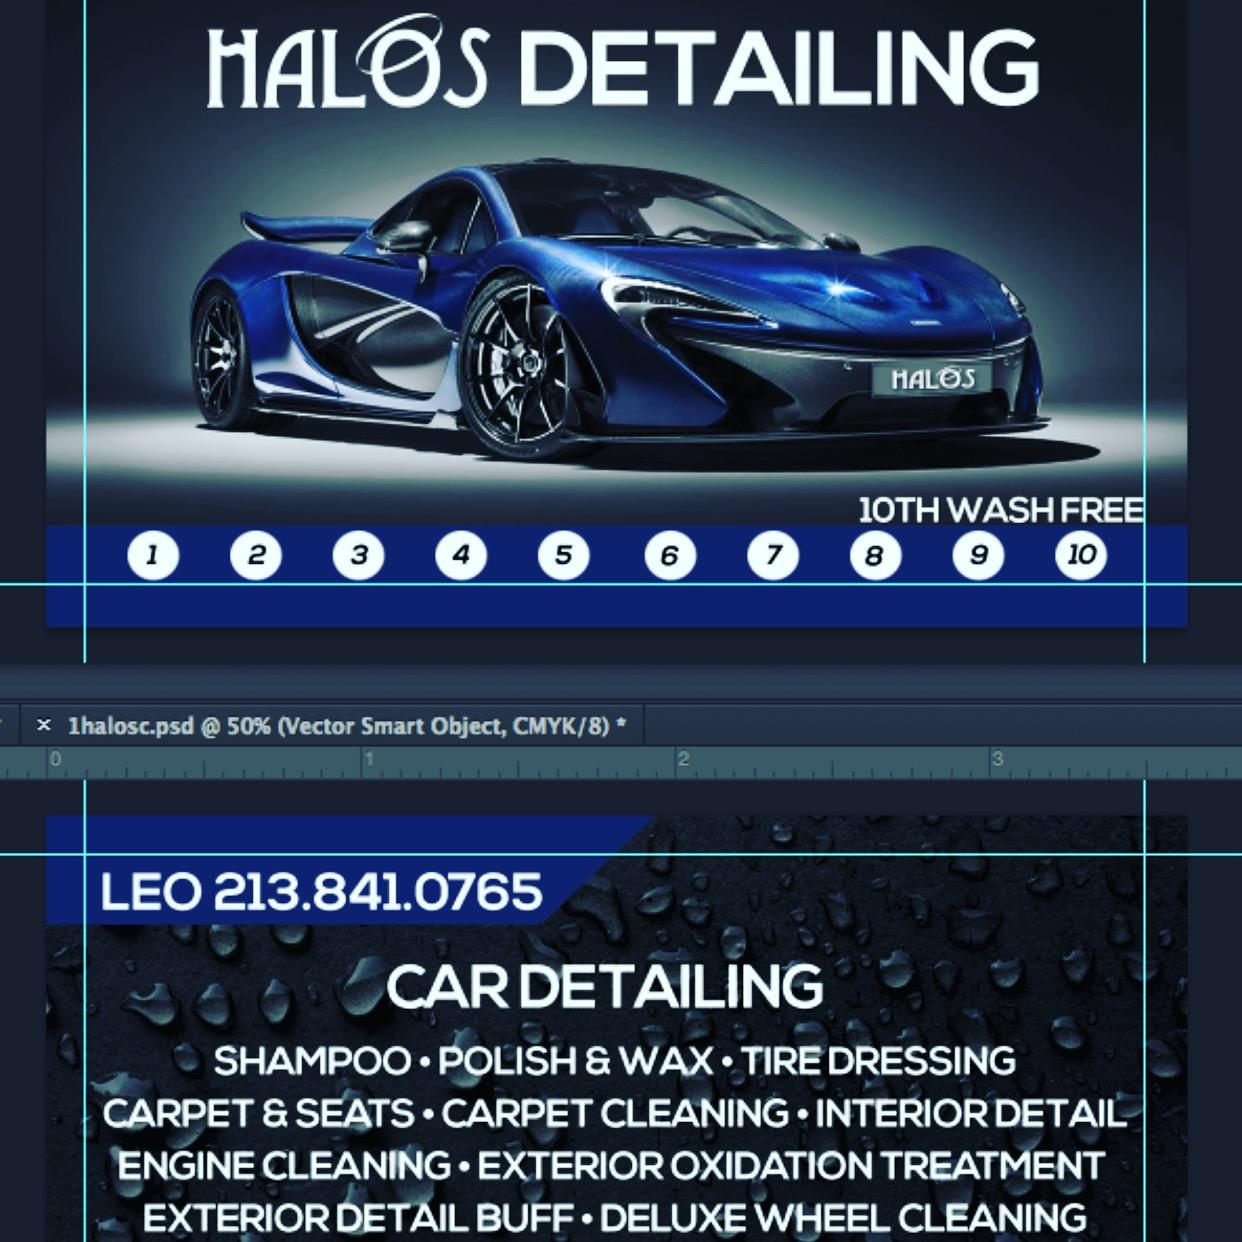 Halos Detailing